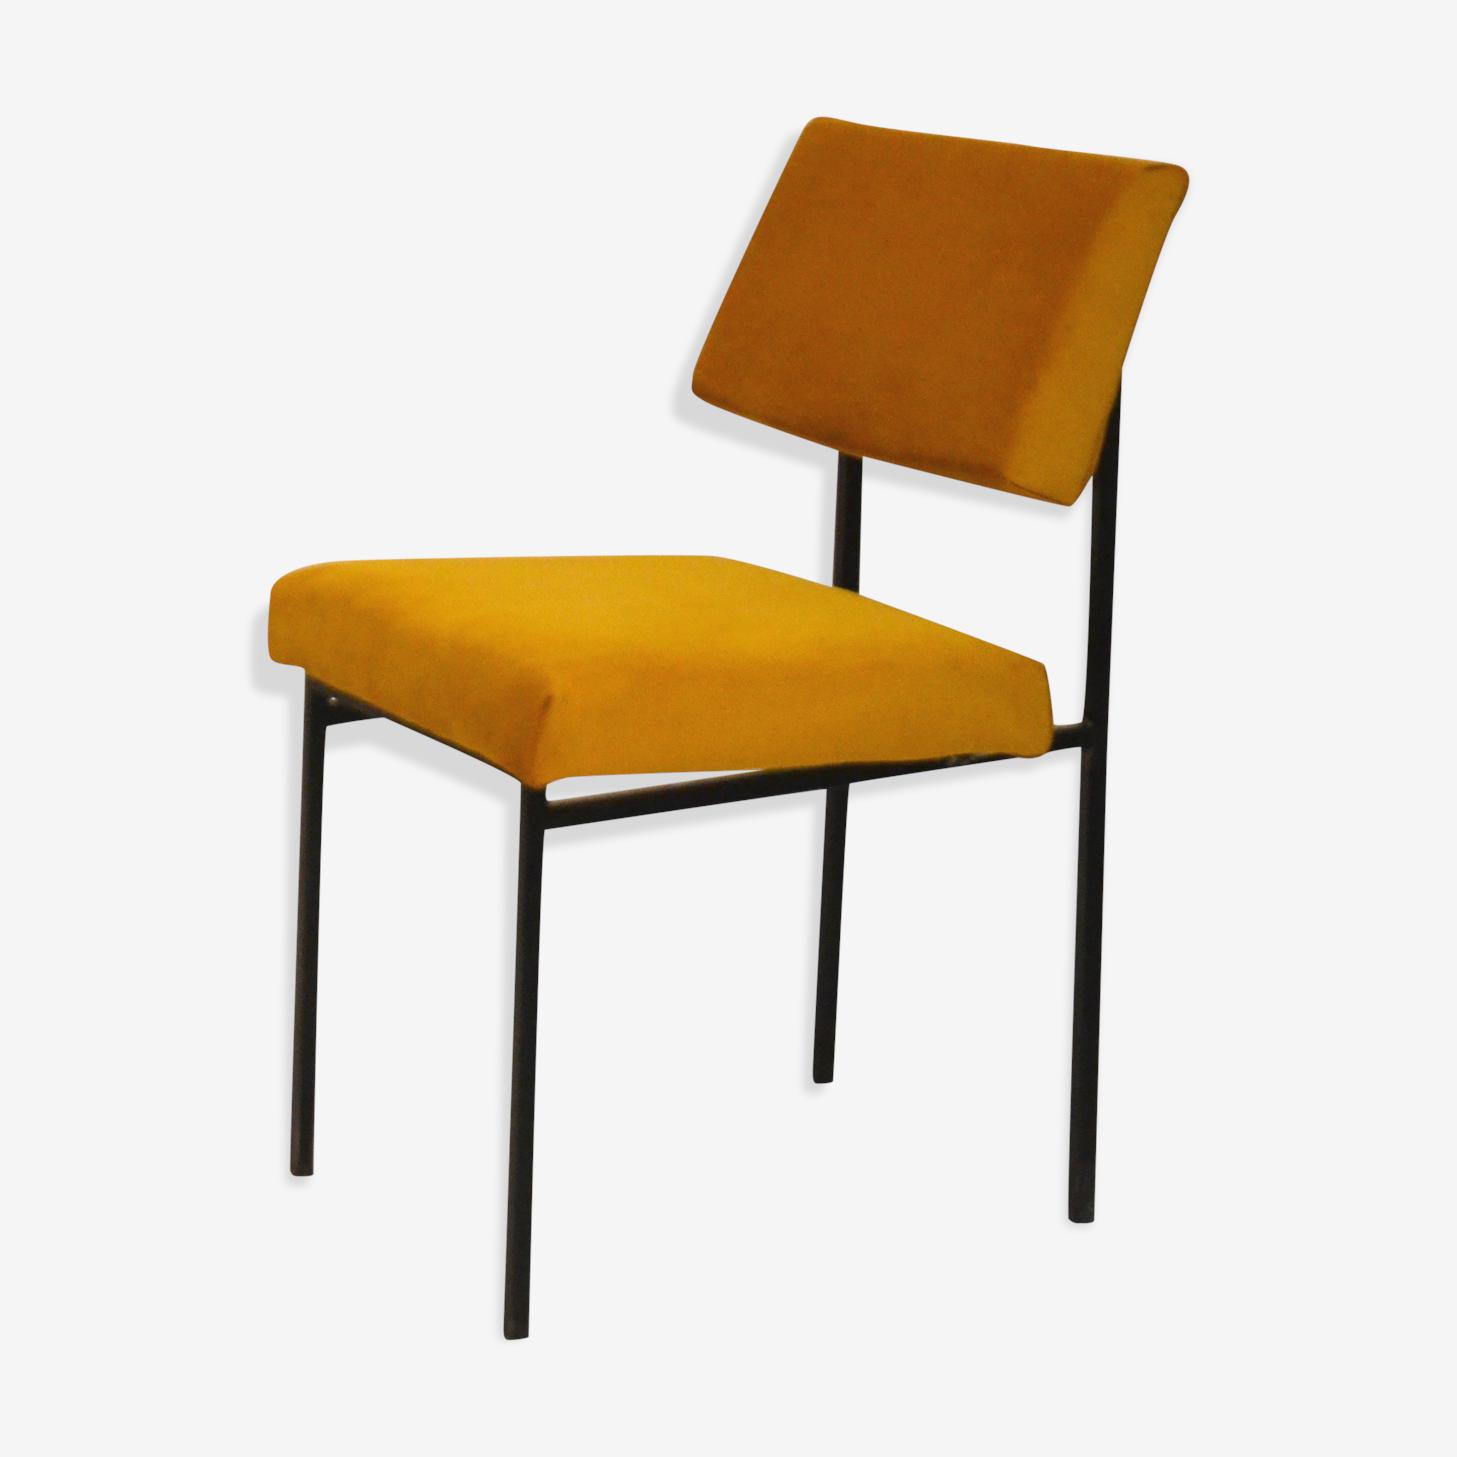 Chair yellow velvet